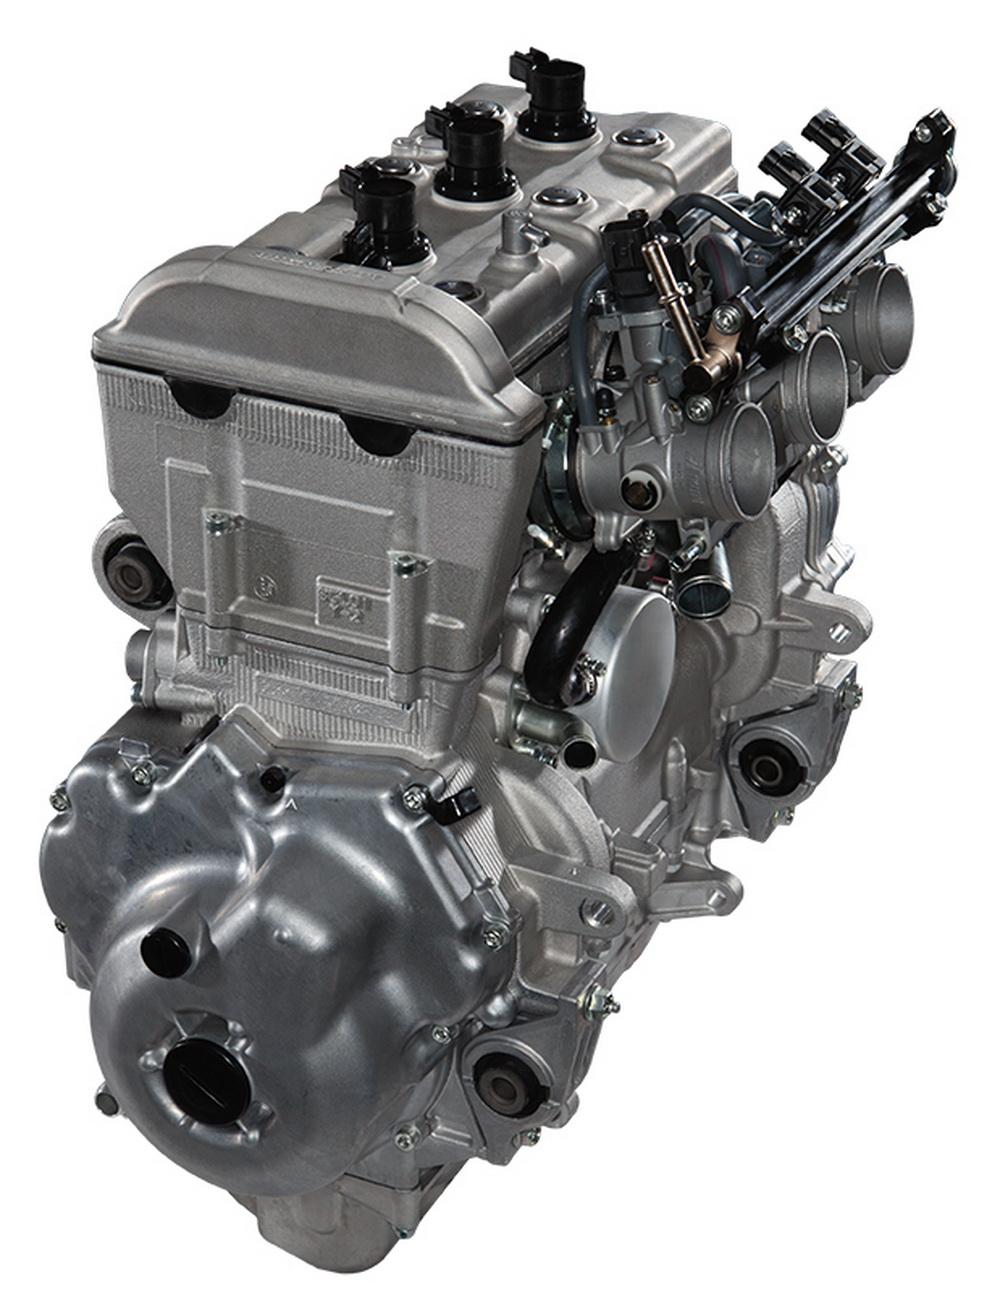 Name 7000 series c tec4 engine_2014 jpg views 13260